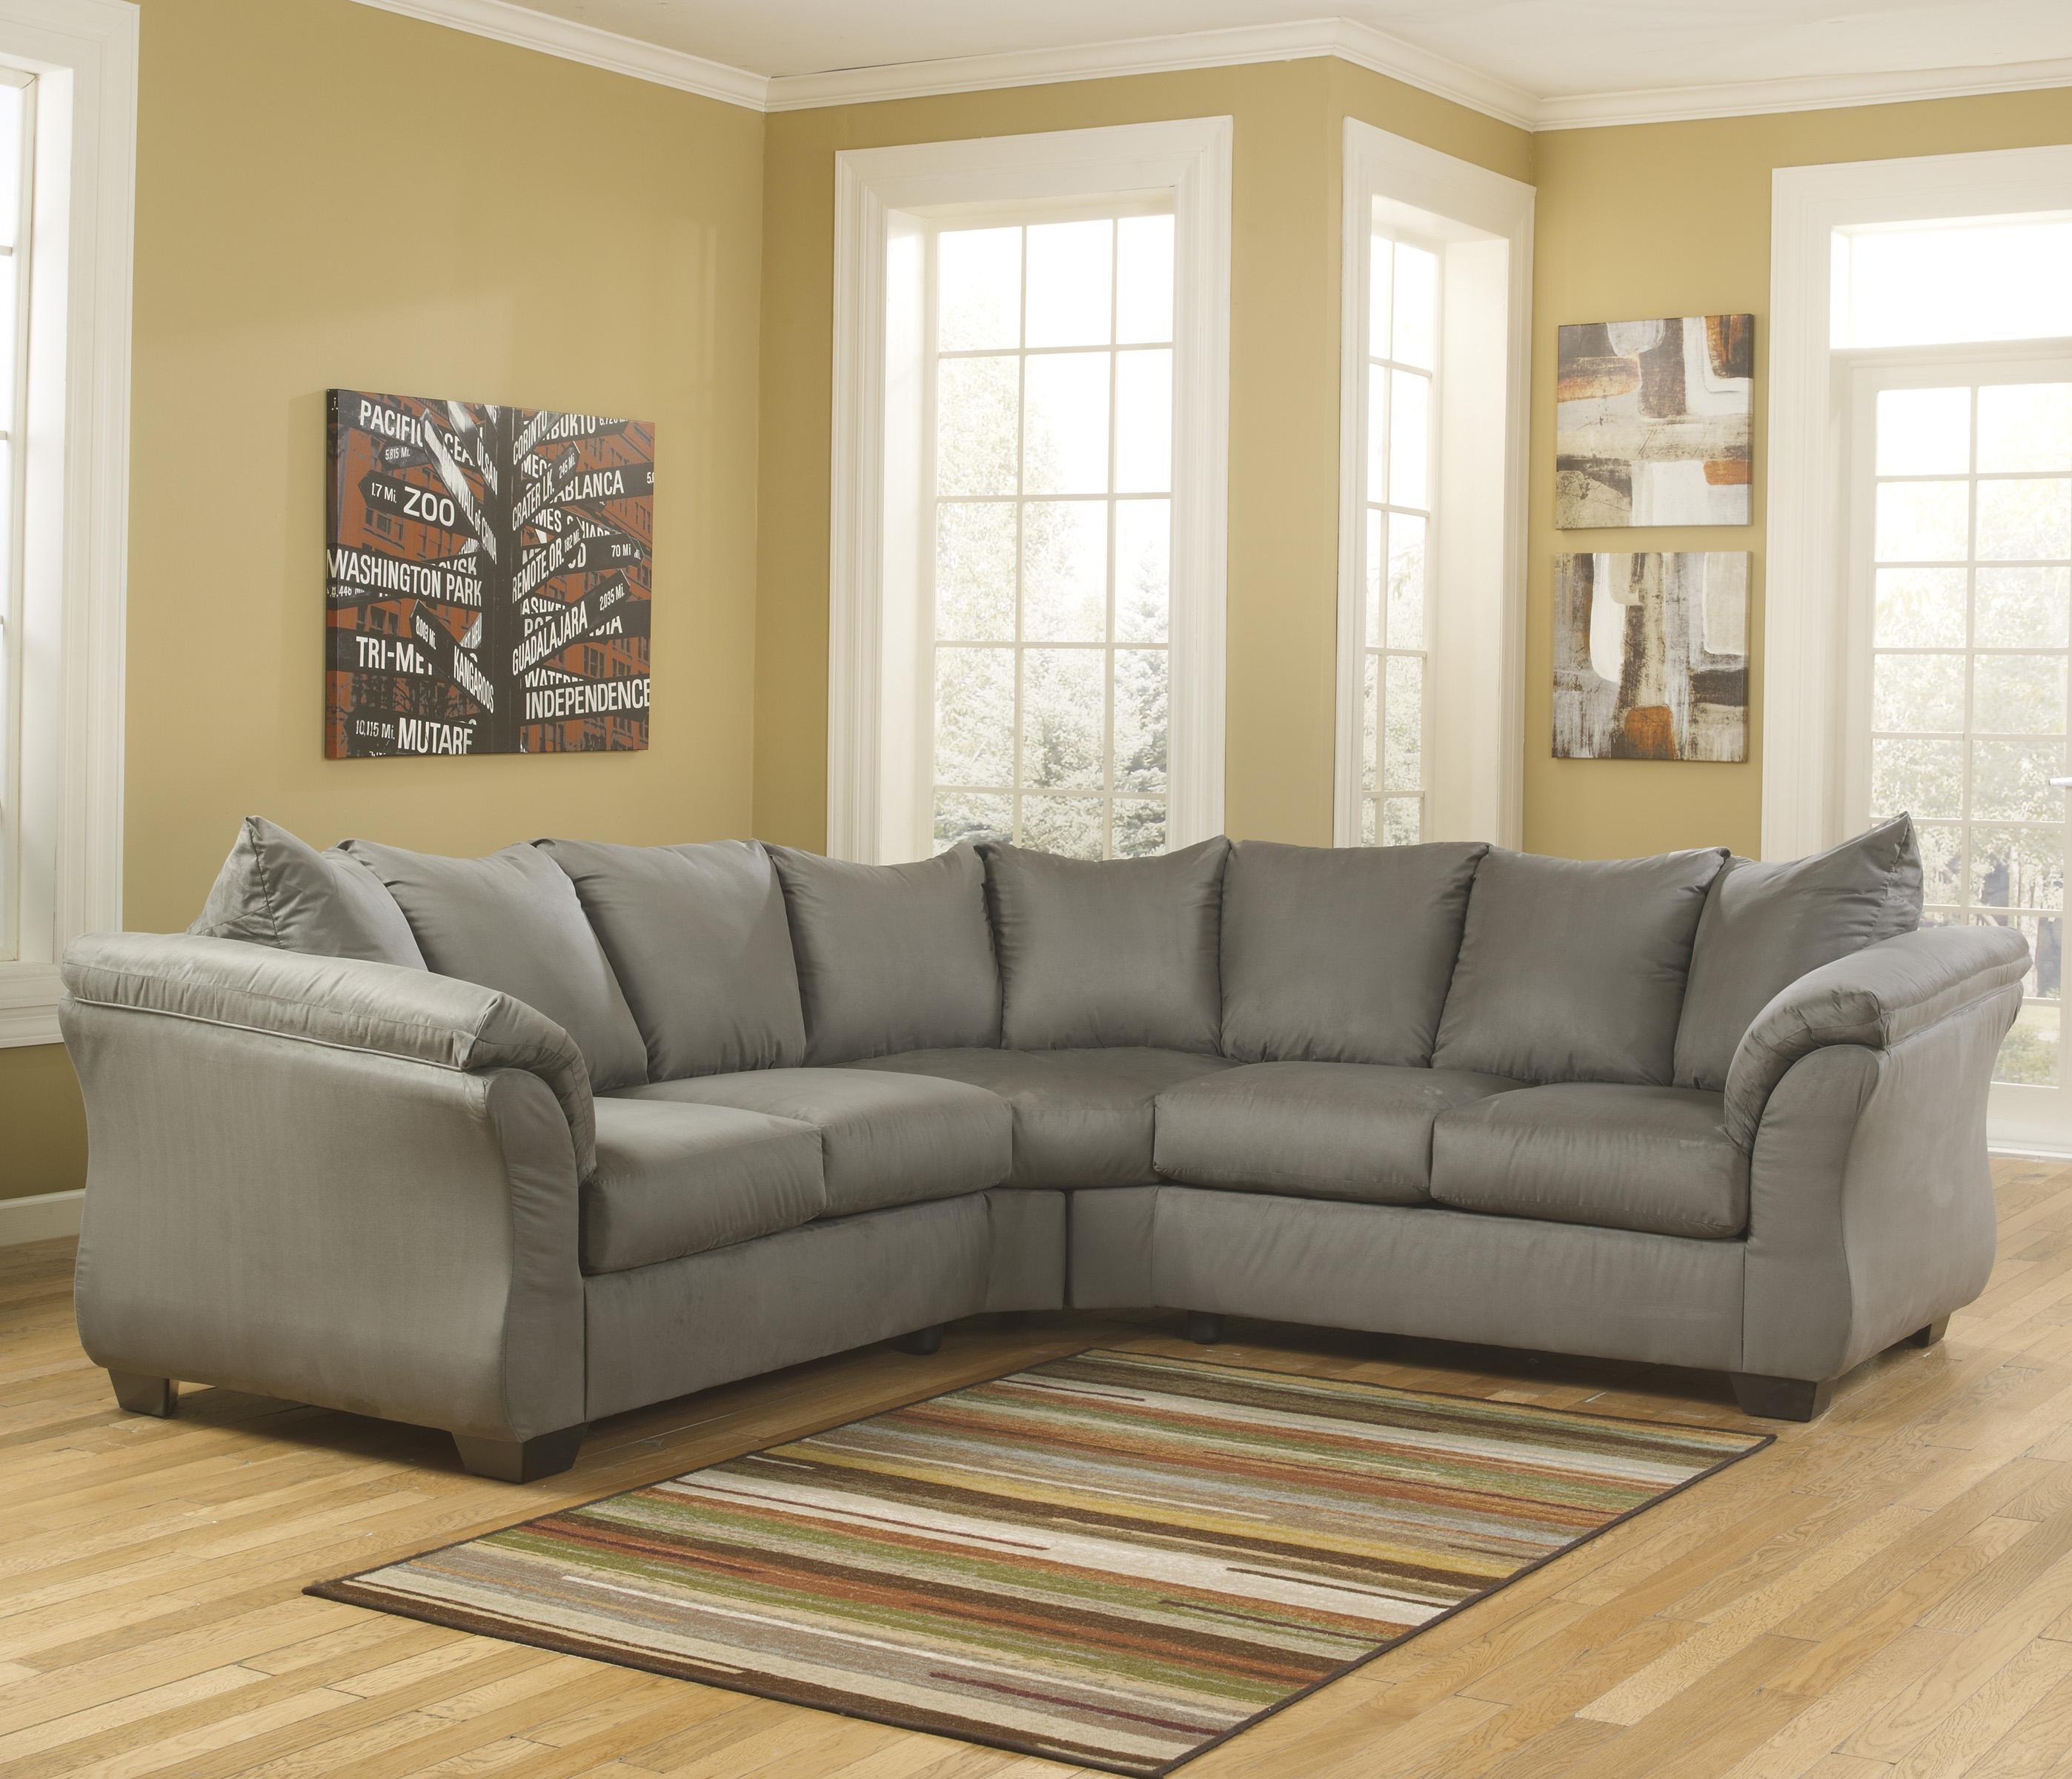 Darcy Corner Sofa House Of Fraser: 10 Inspirations Kingston Ontario Sectional Sofas